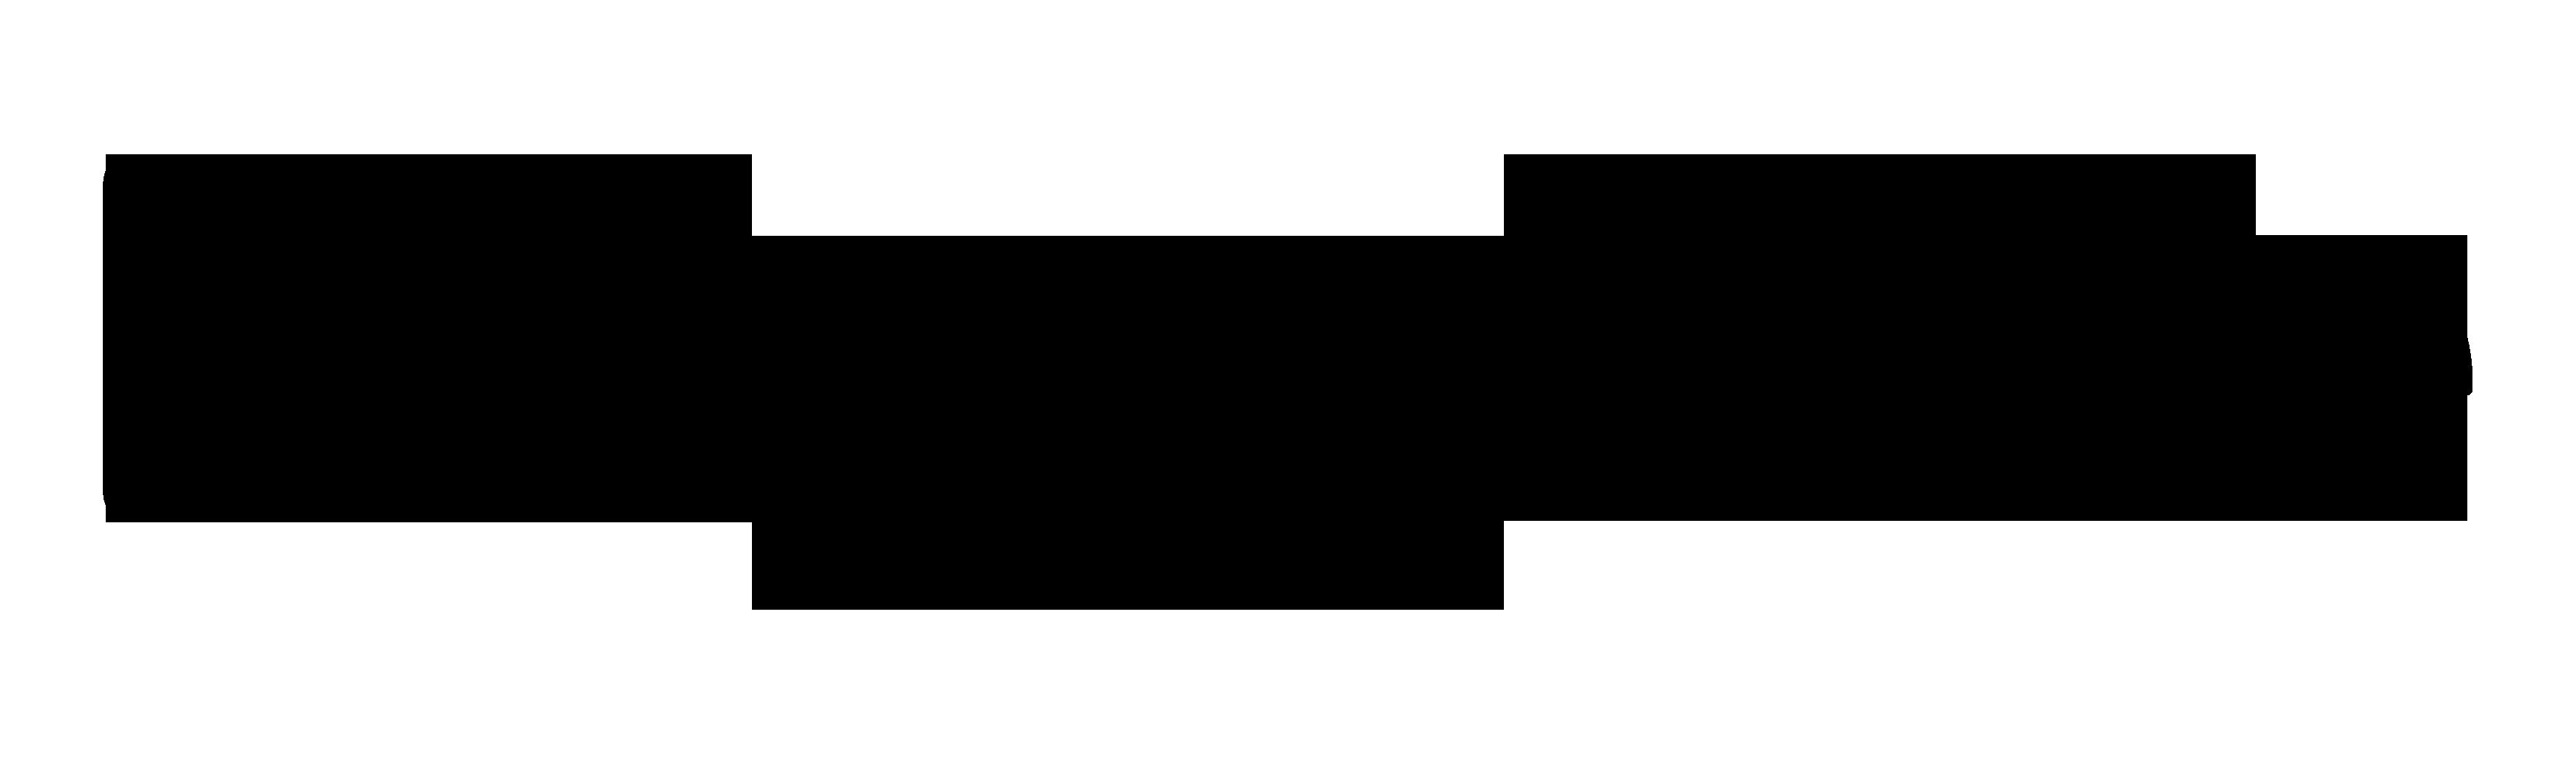 DropSuite-logo-Black-Transparent-Background